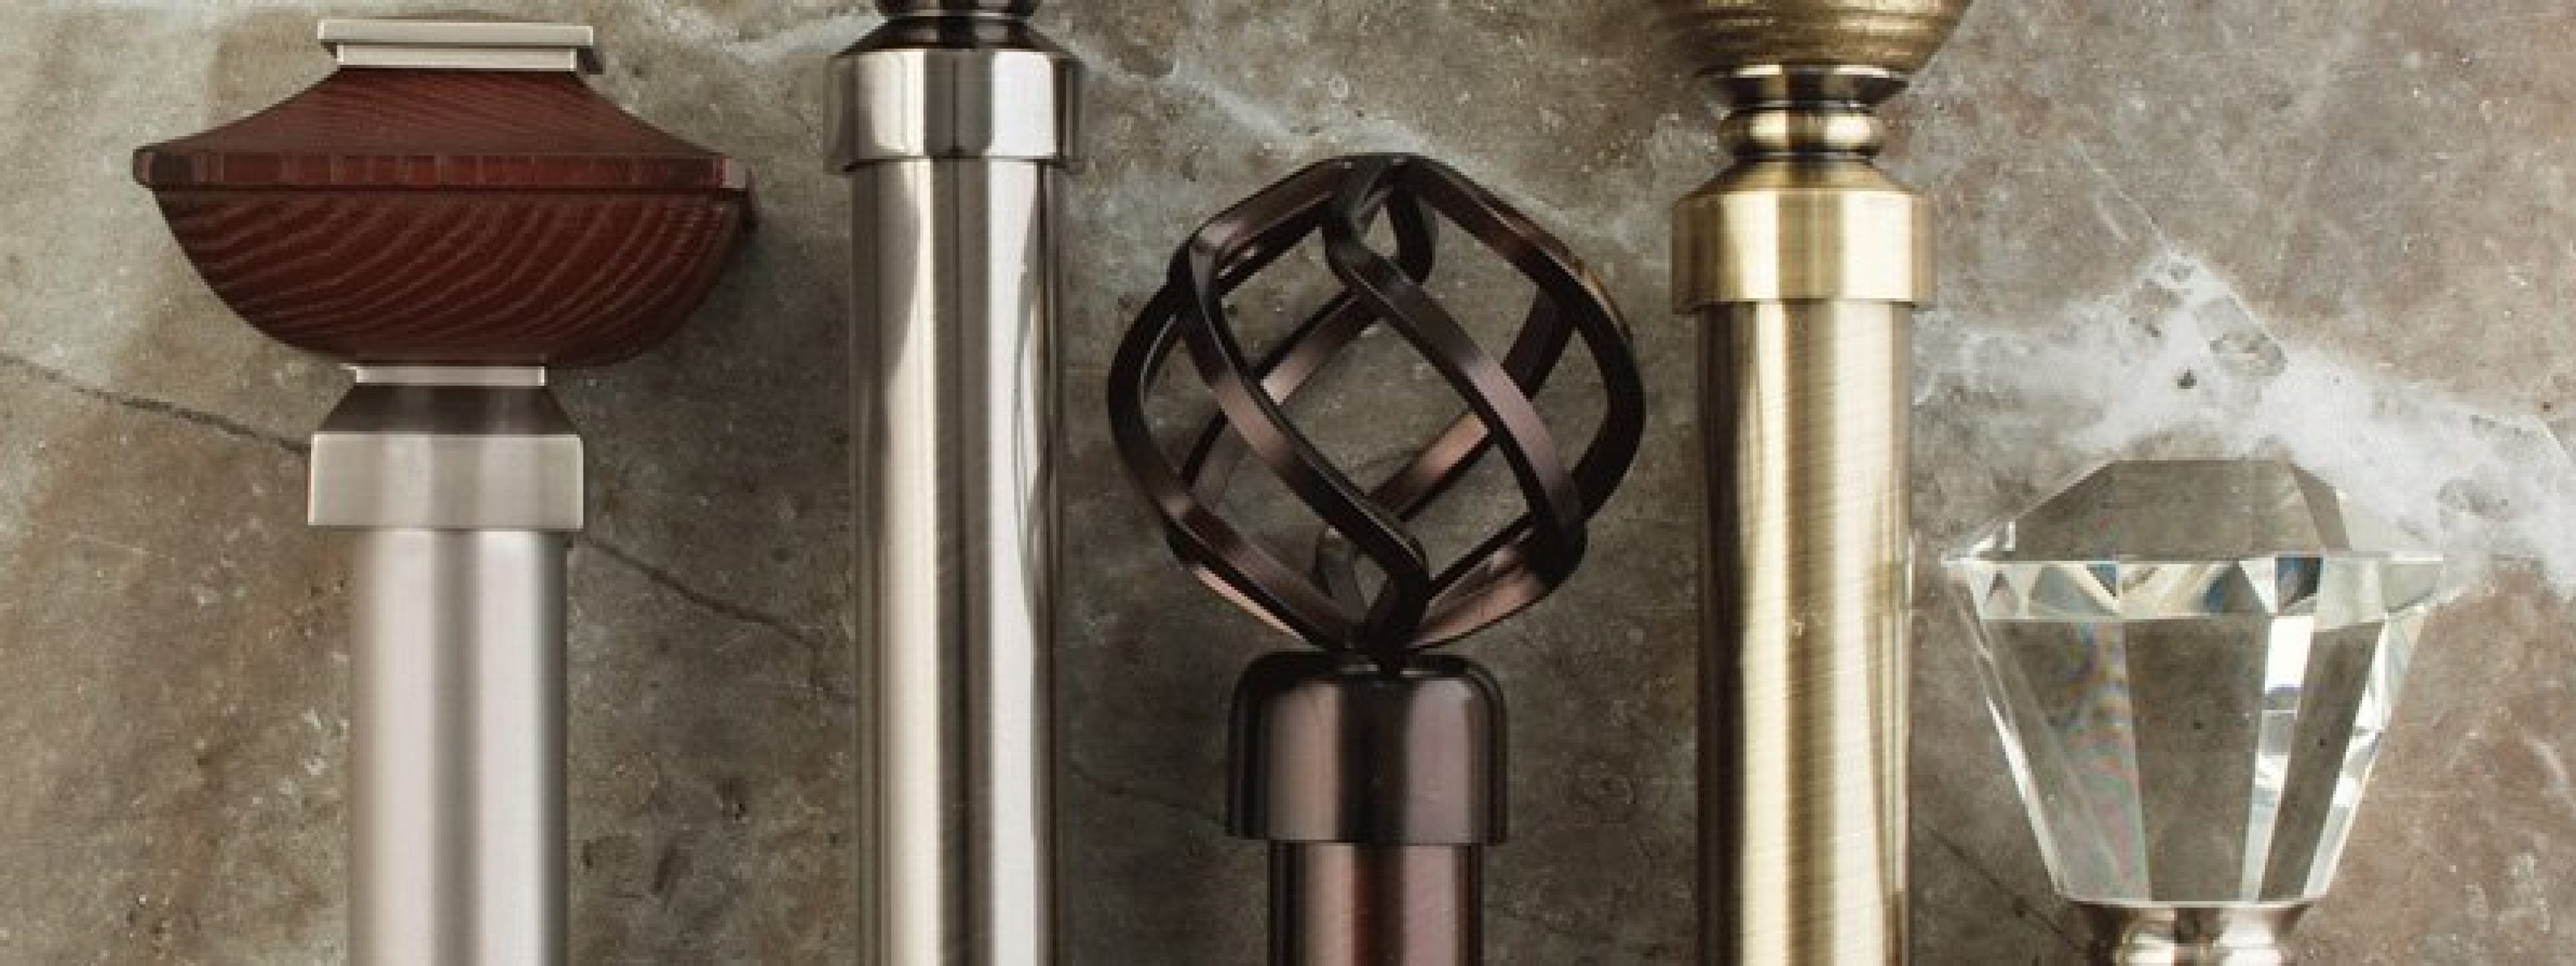 drapery-rods-hardware